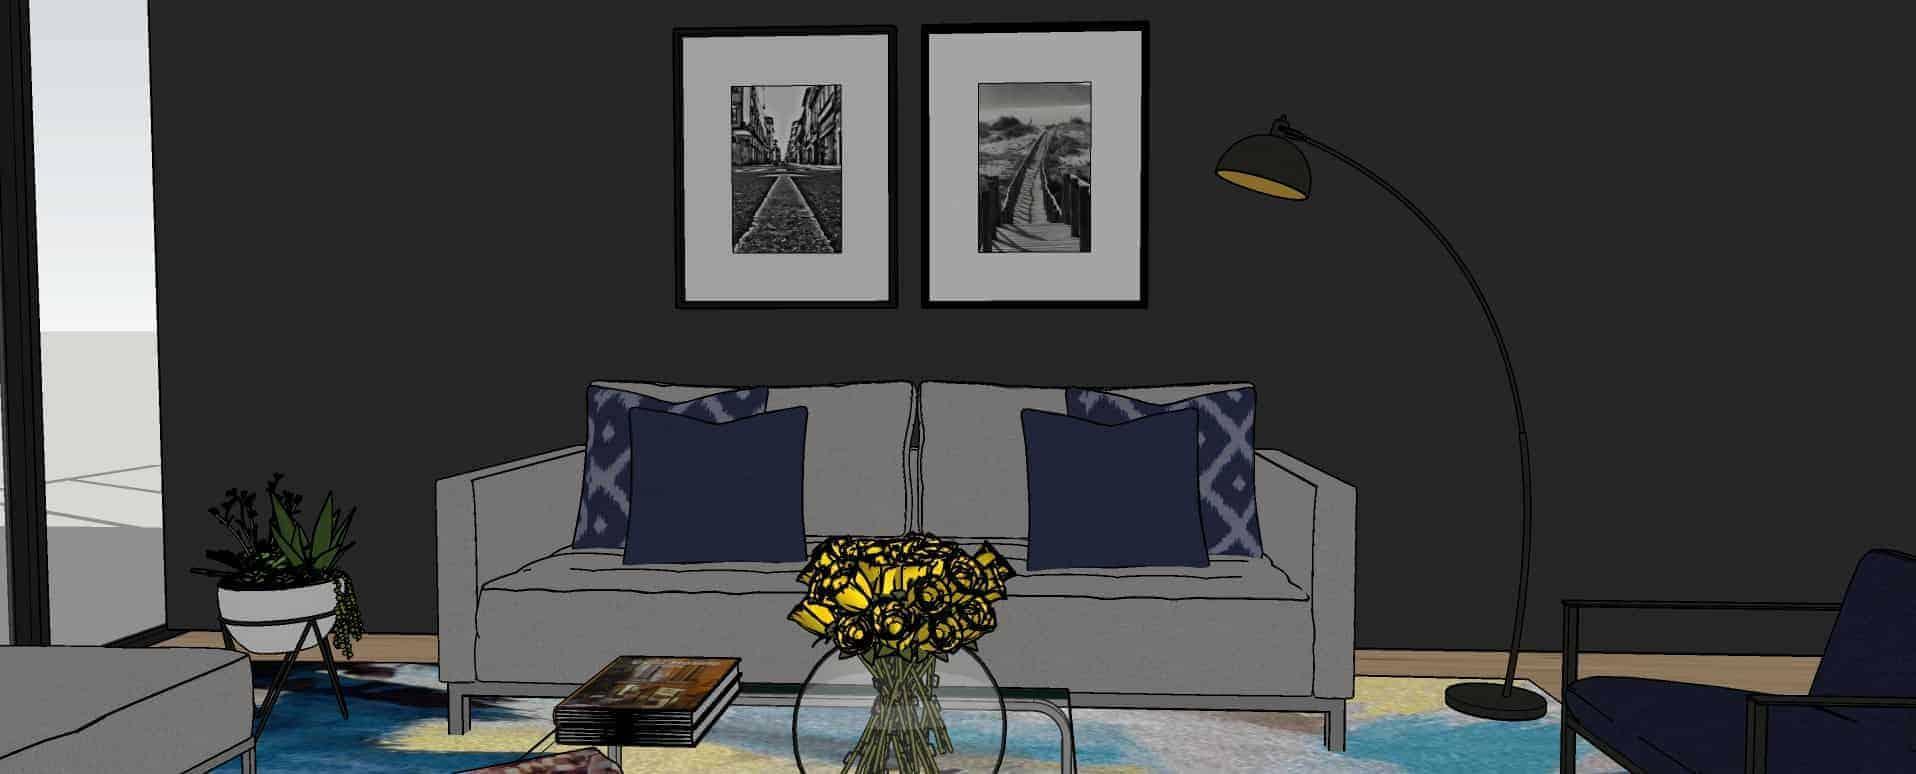 basic-sketchup-living-room-view-2_orig